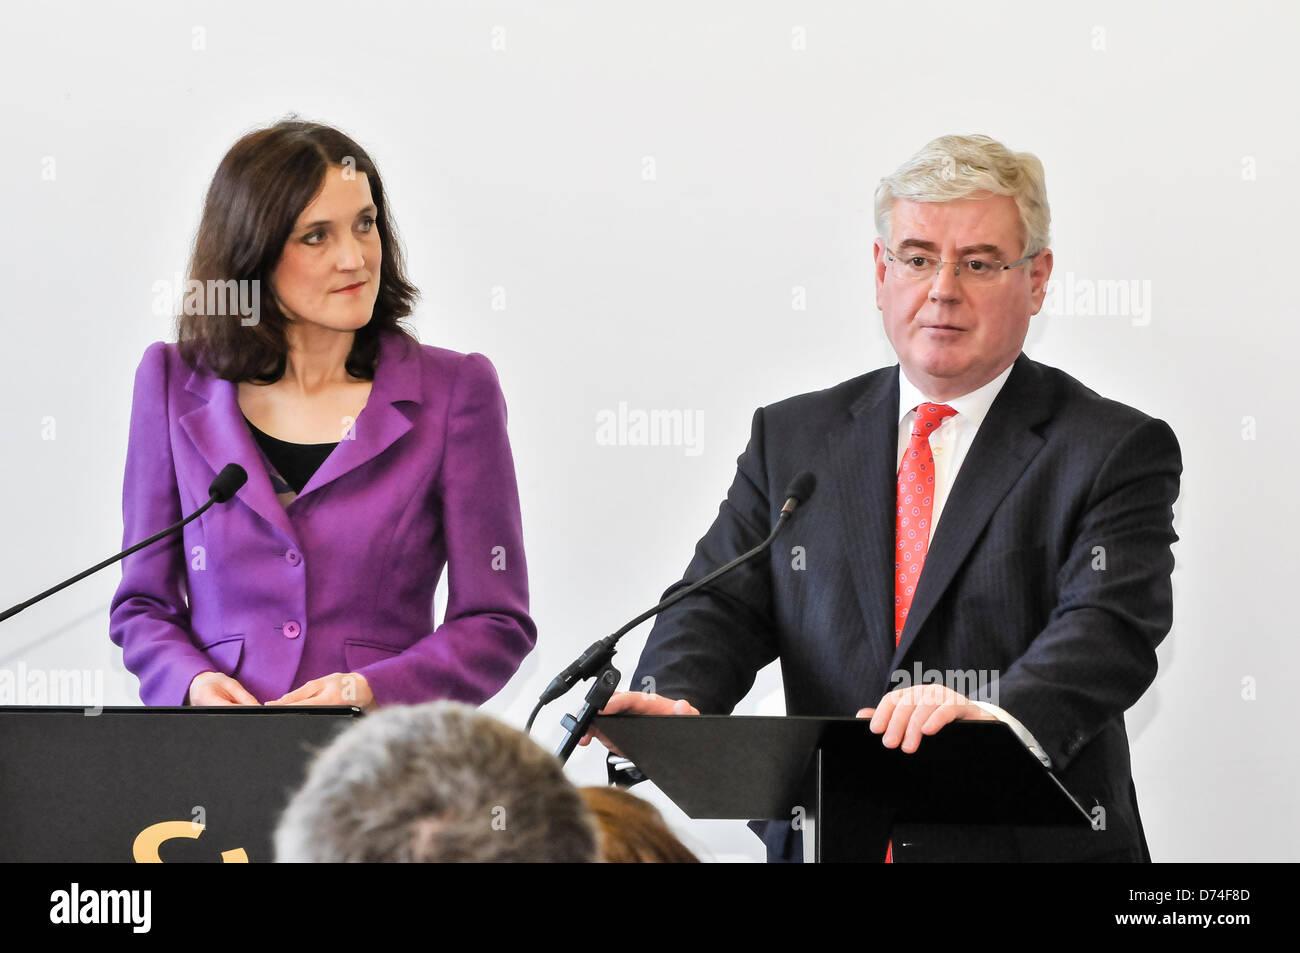 Belfast, Northern Ireland. 29th April 2013. Secretary of State Theresa Villiers and Irish Tánaiste Eamon Gilmore - Stock Image